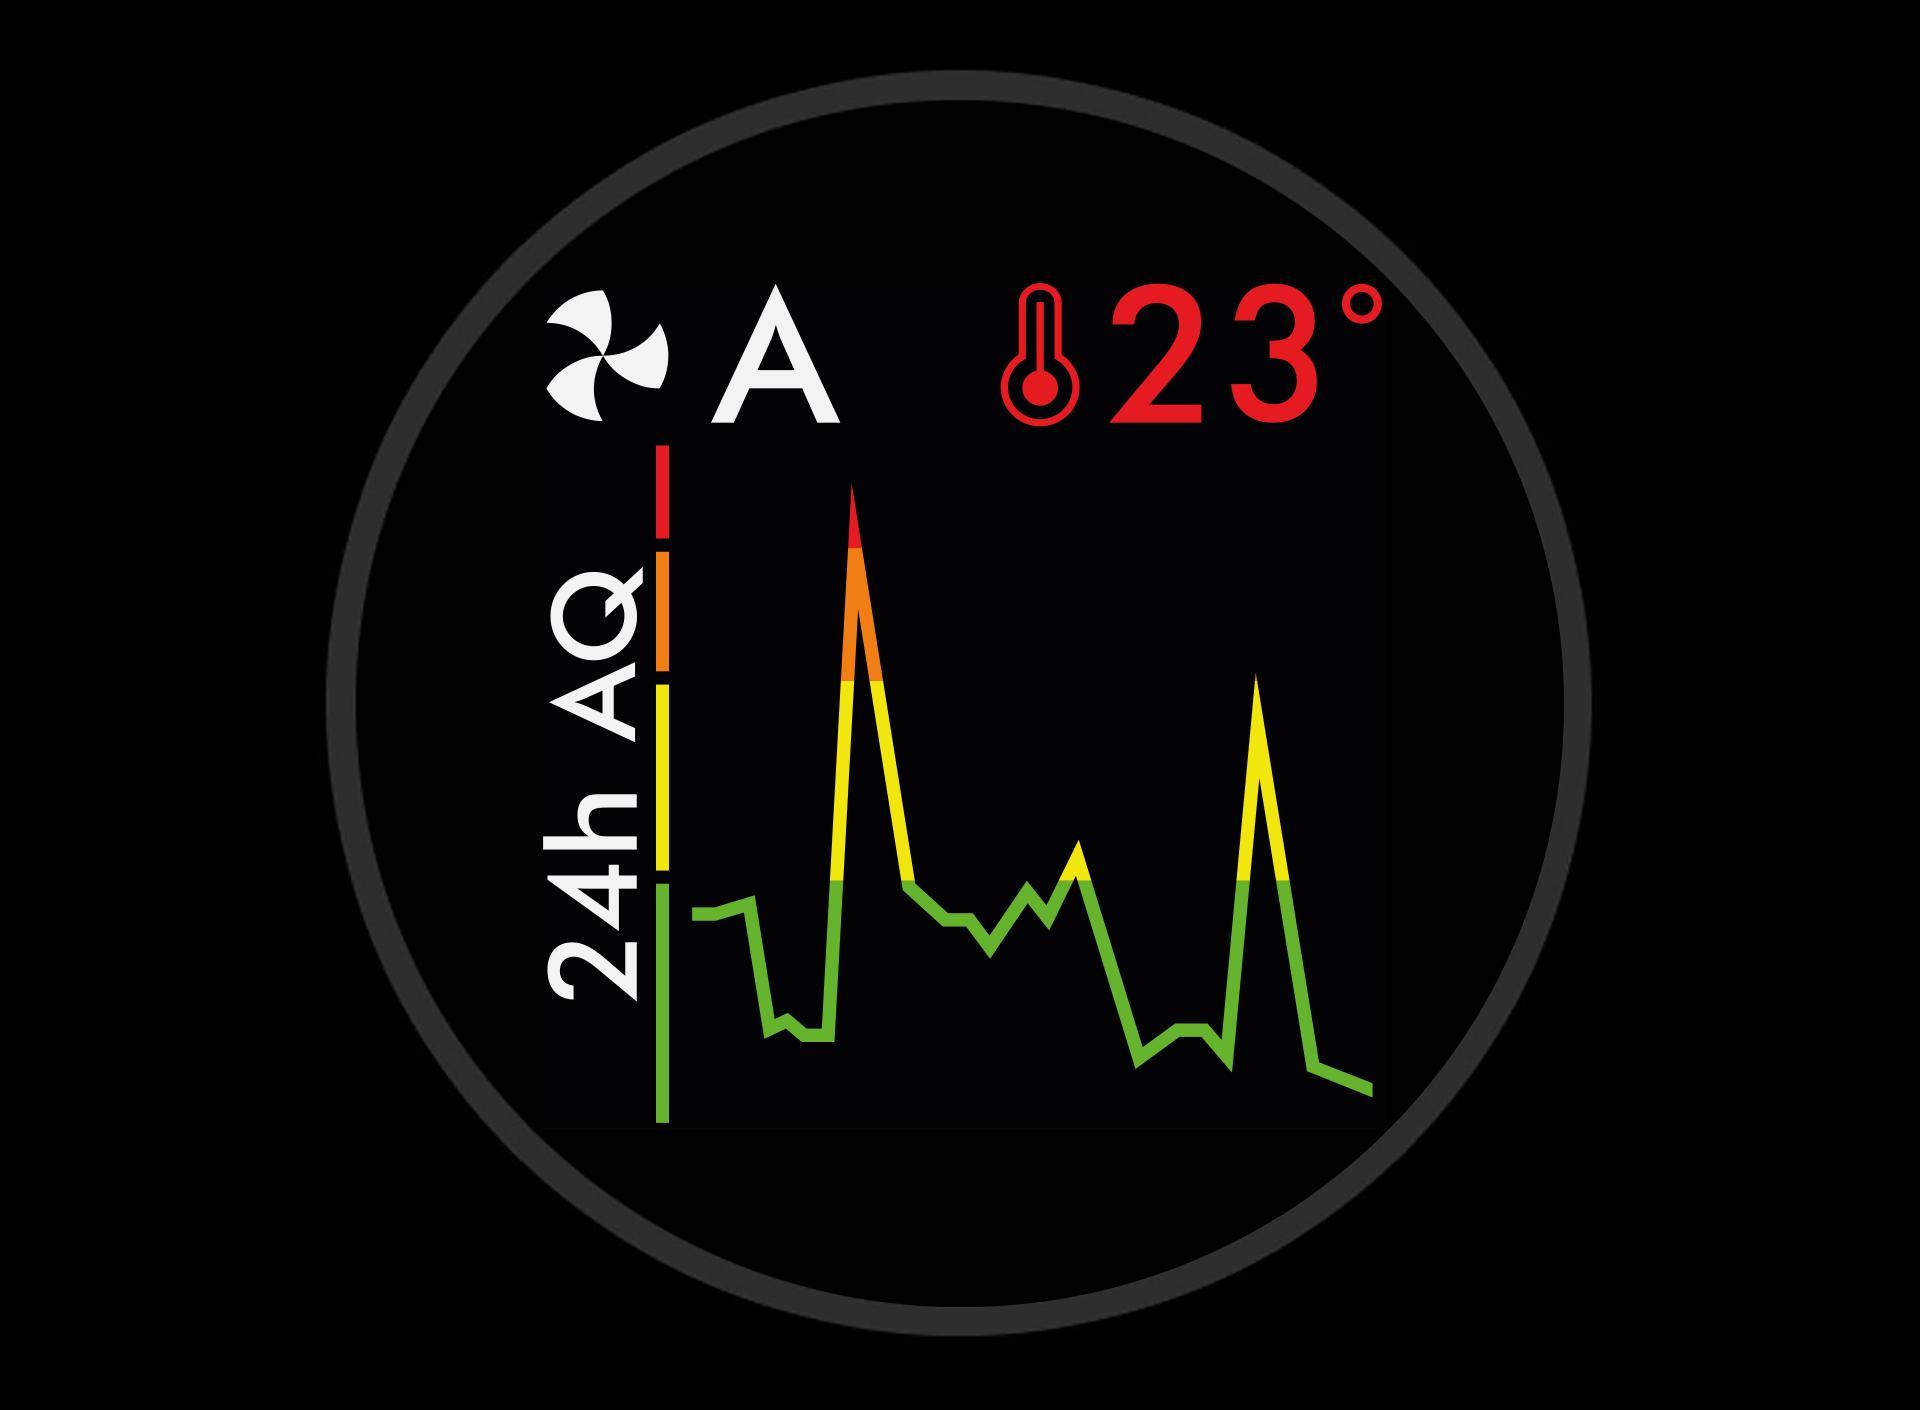 24-hour air quality graph